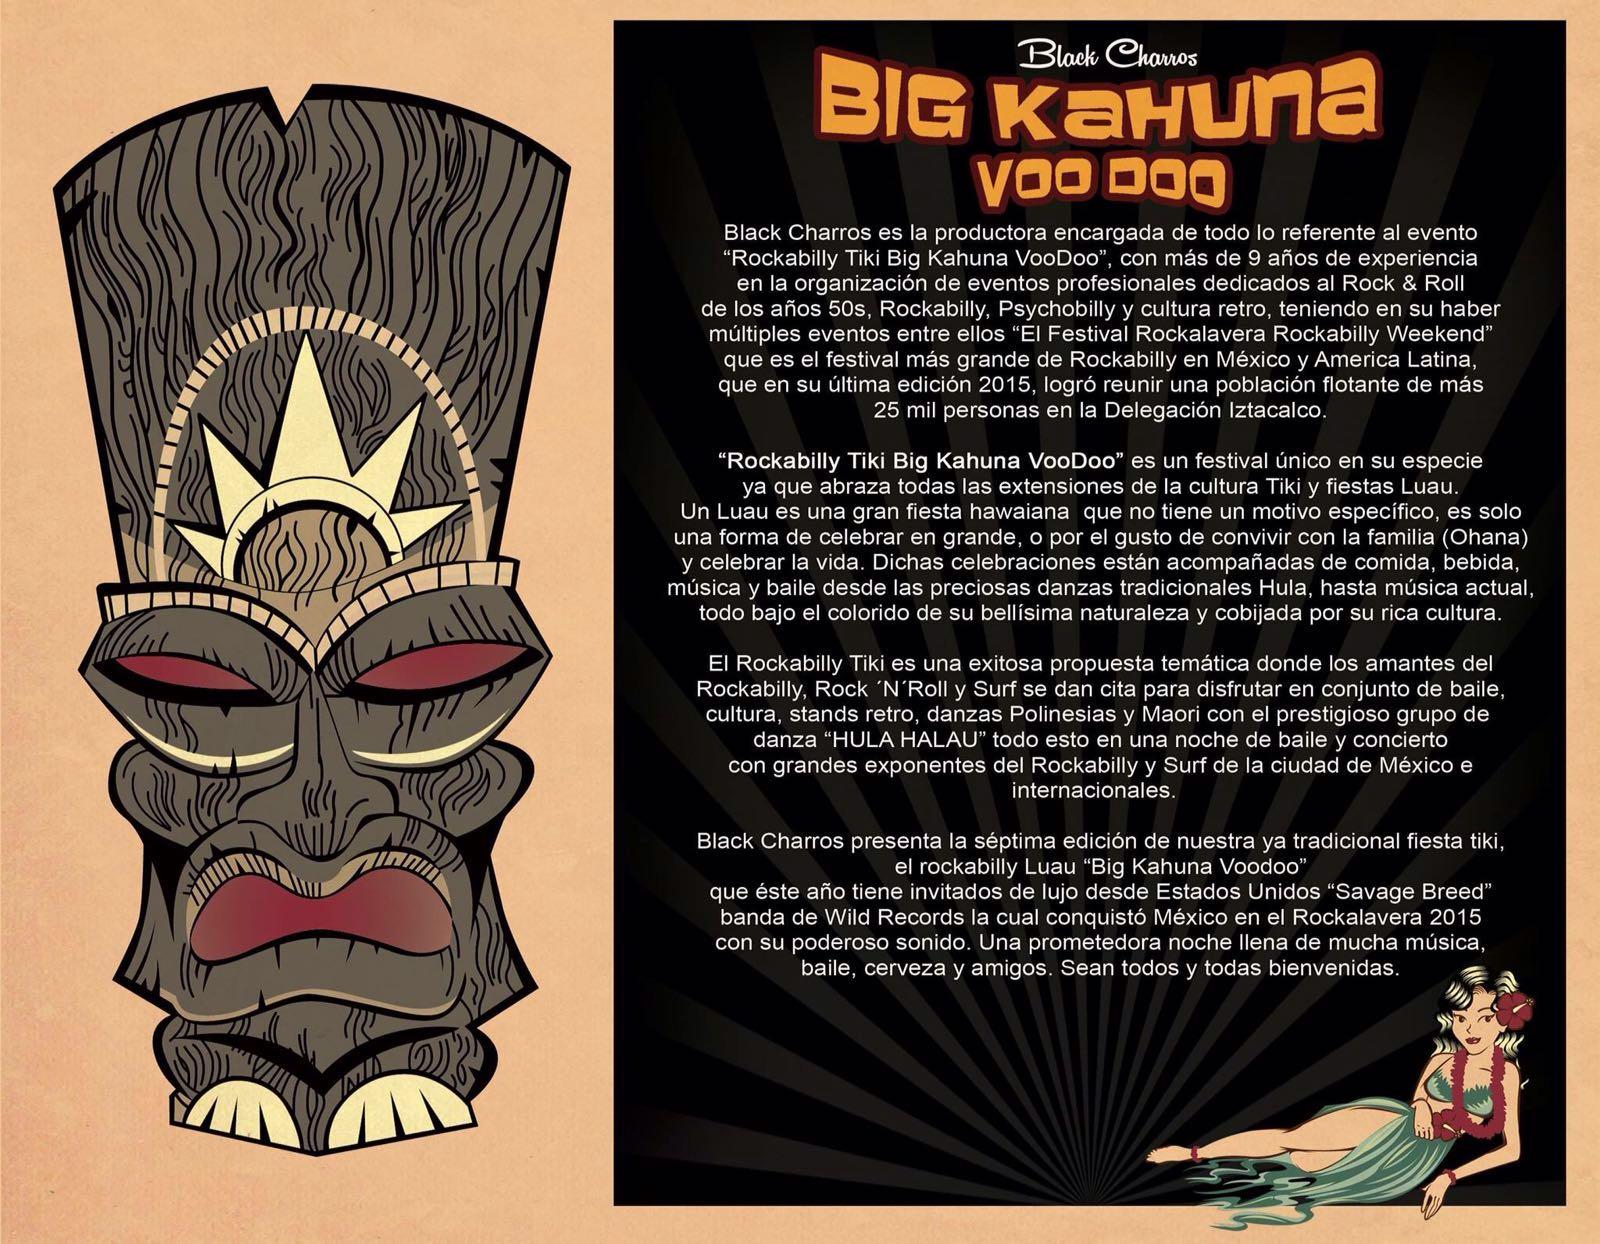 Big Kahuna voo doo